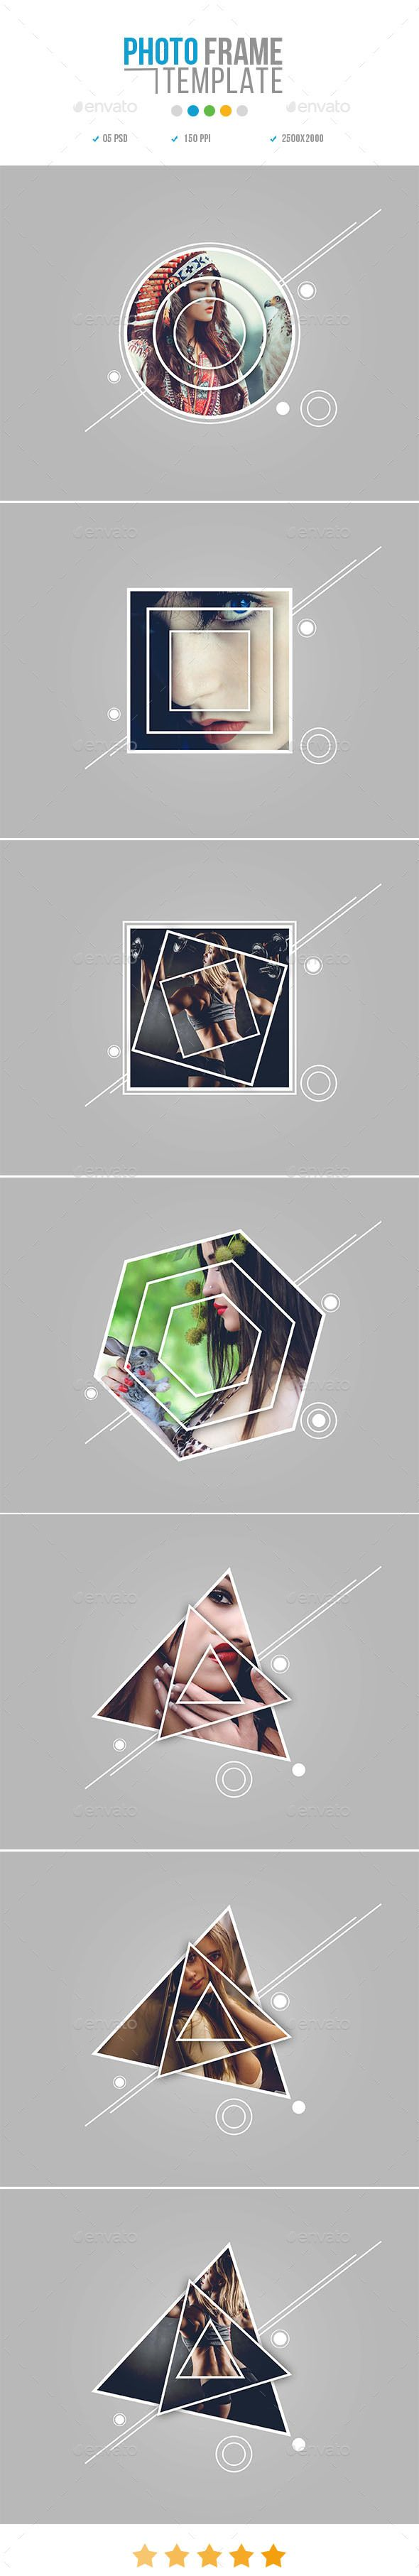 #Photo Frame Templates - Photo #Templates Graphics